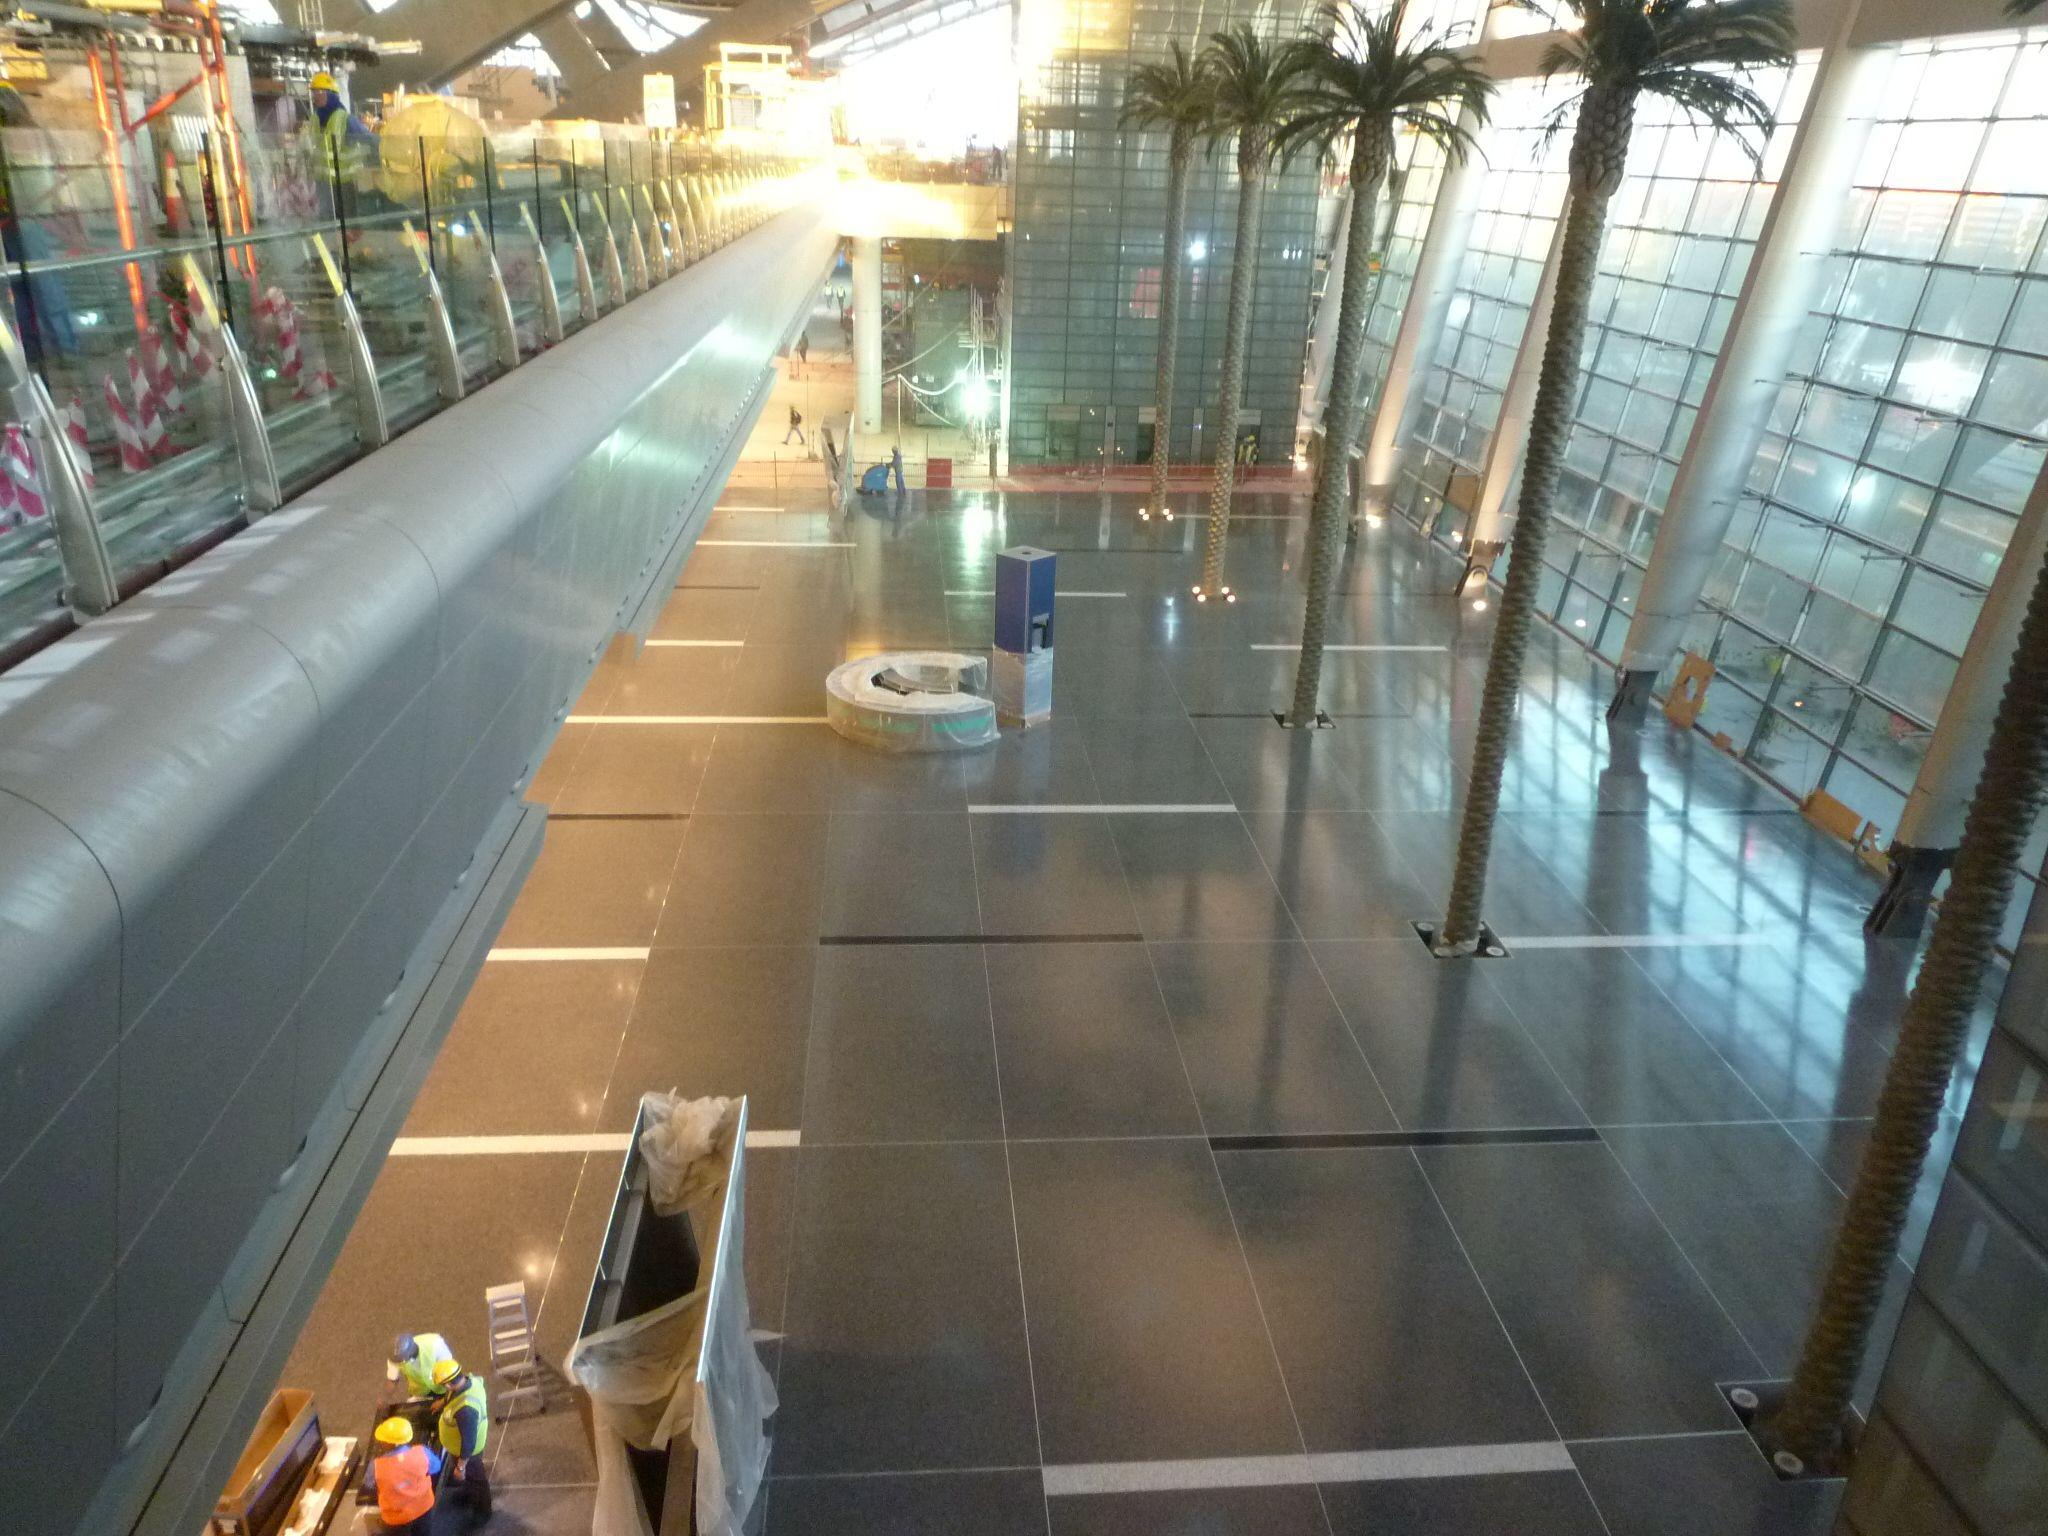 Qatar International Airport Terrazzo Floor Project Used Bio